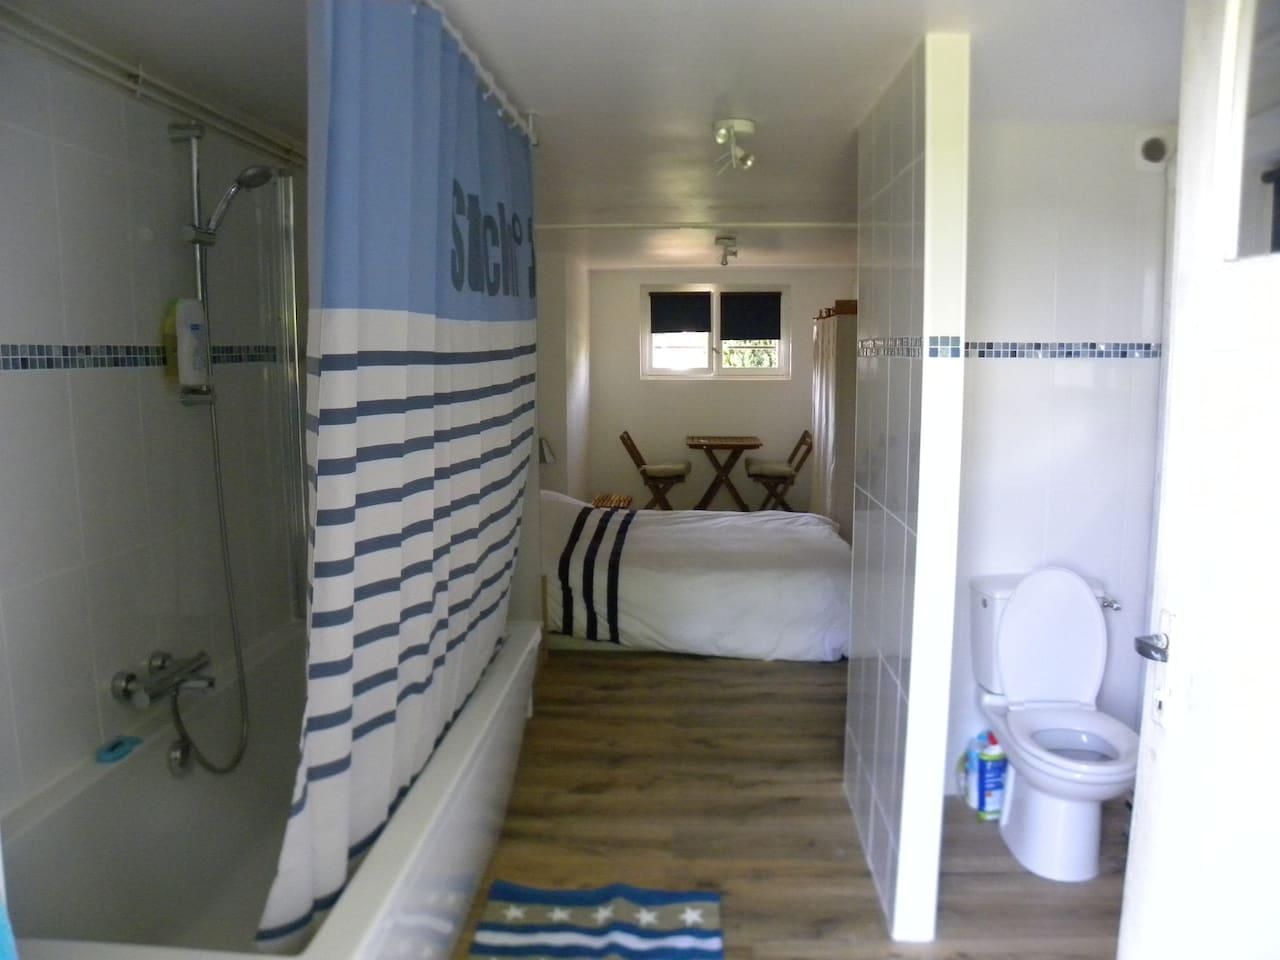 Chambre et salle de bain privative